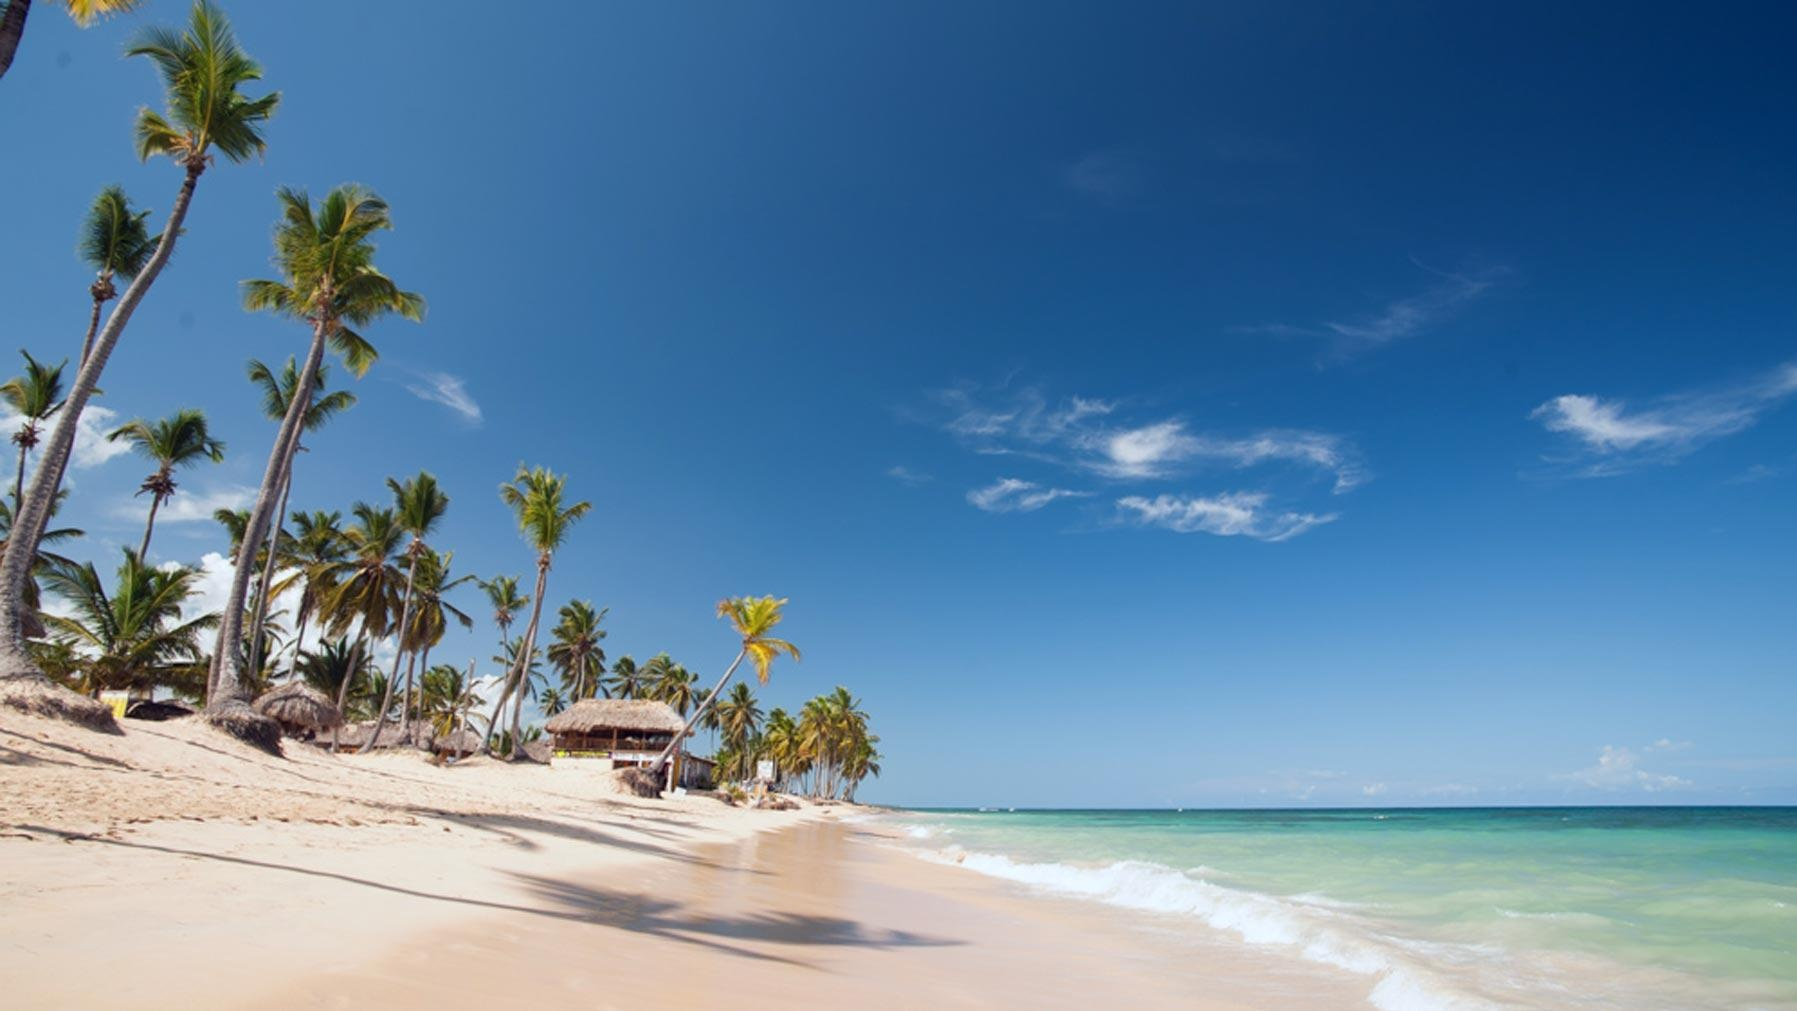 Htel 5 toiles Luxury Bahia Principe Esmeralda, Punta Cana Photos sirenis tropical punta cana